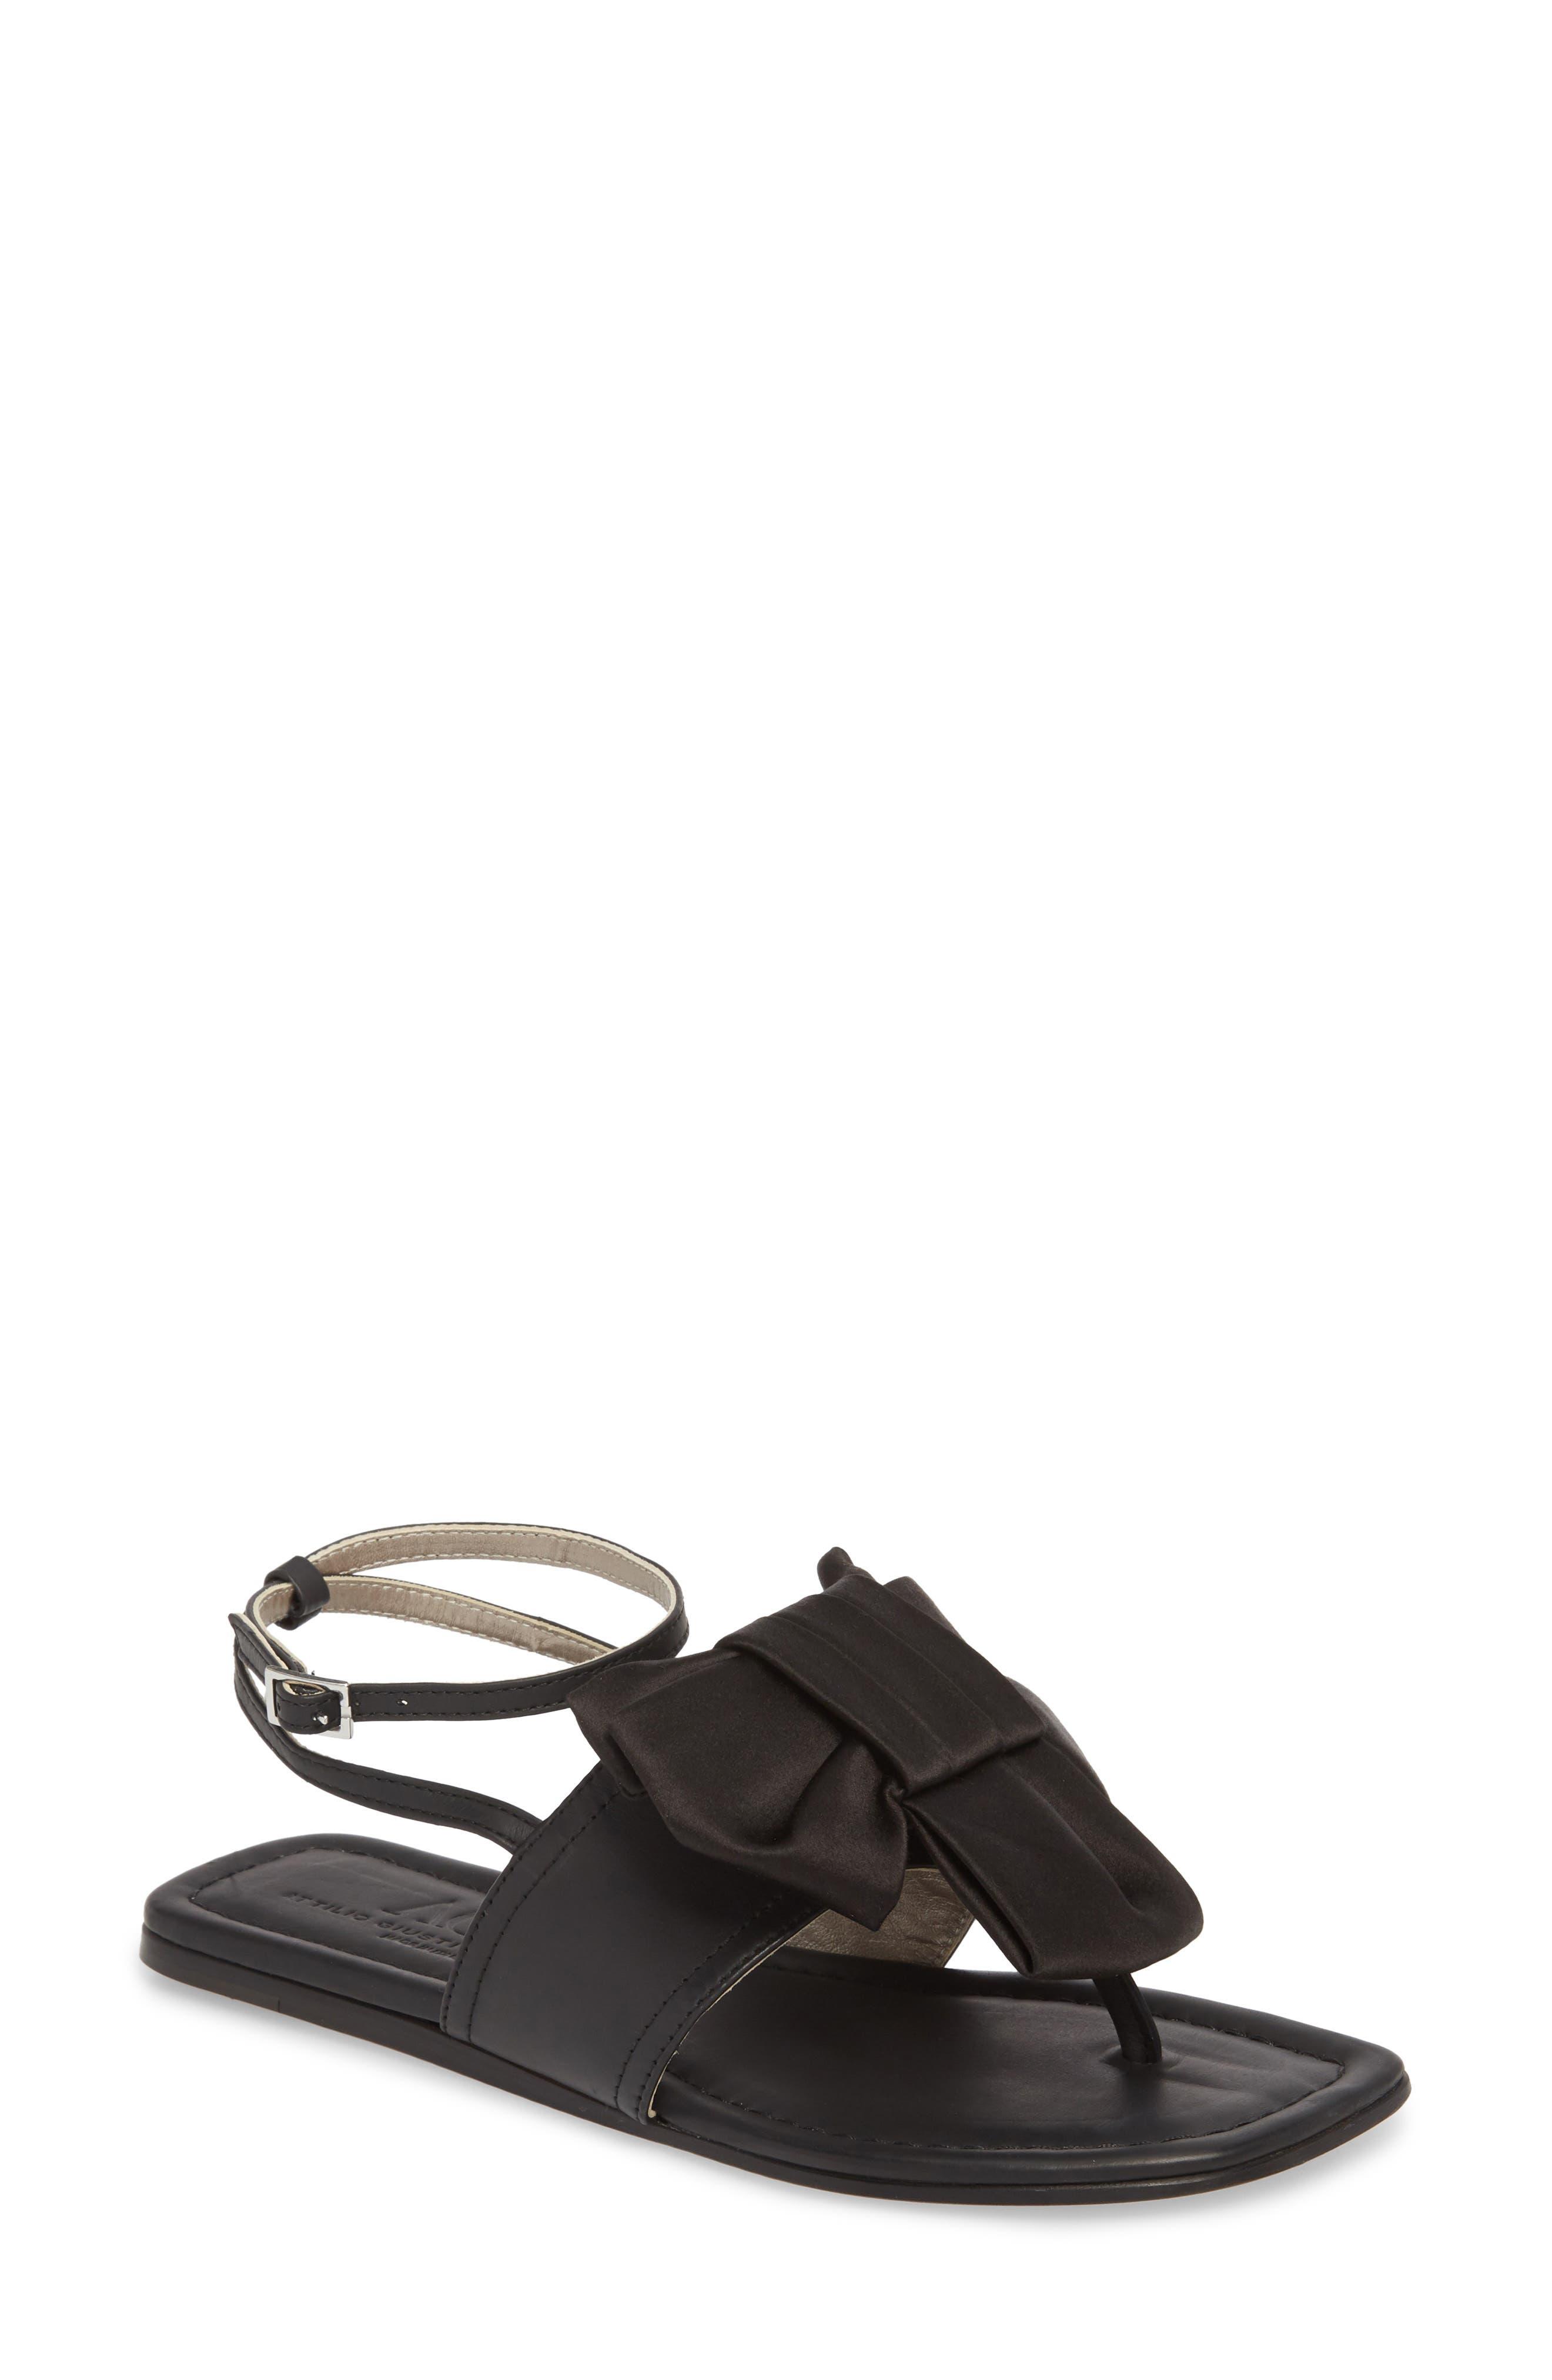 Ankle Strap Sandal,                             Main thumbnail 1, color,                             Black Leather